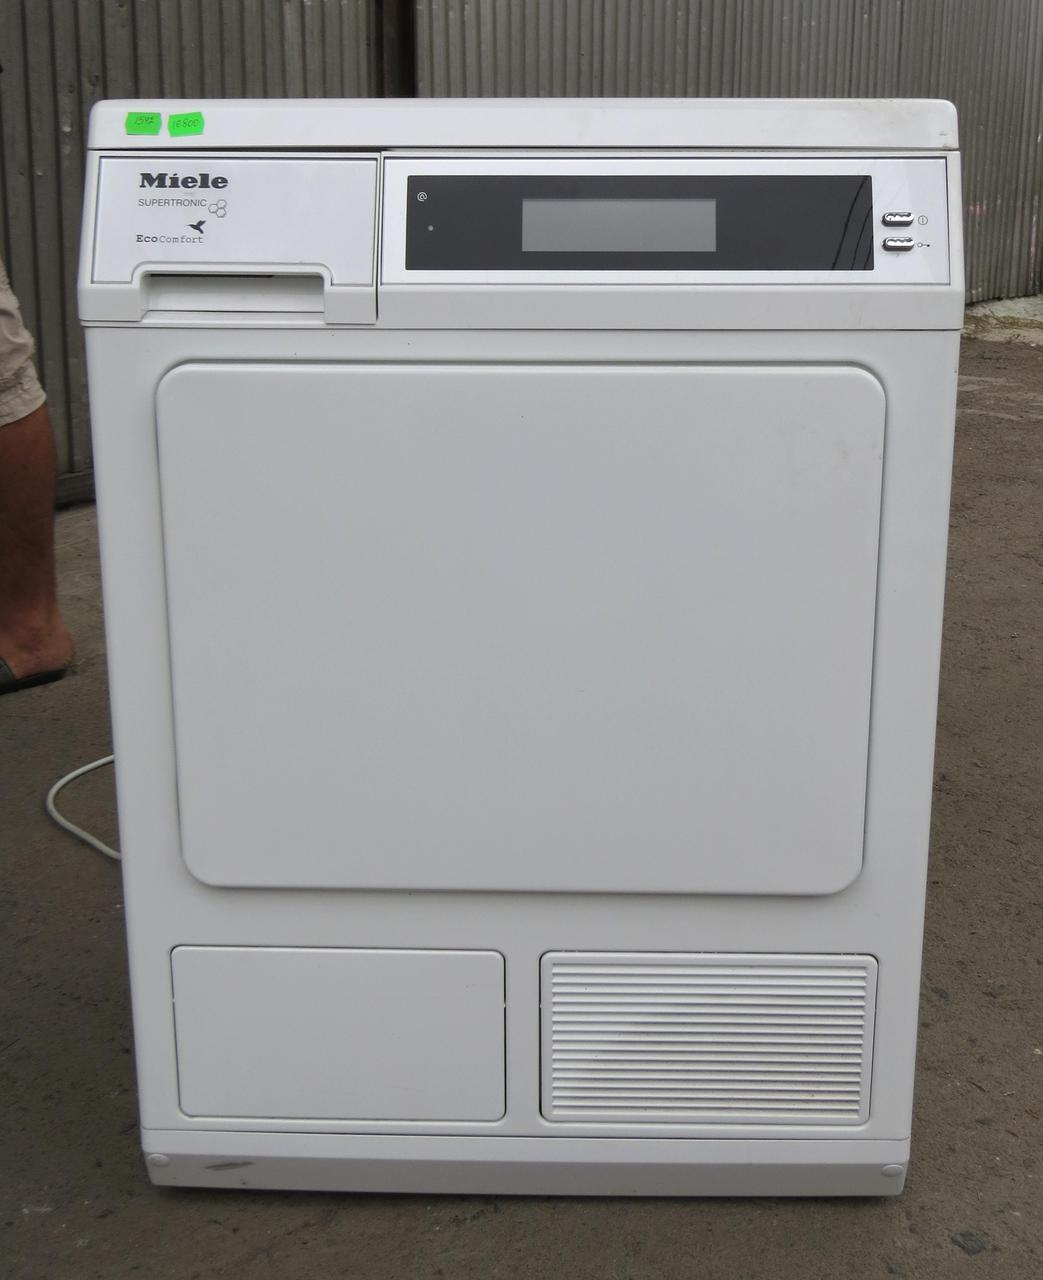 Сушильная Машина MIELE T8000WP Supertr (Код:1542) Состояние: Б/У